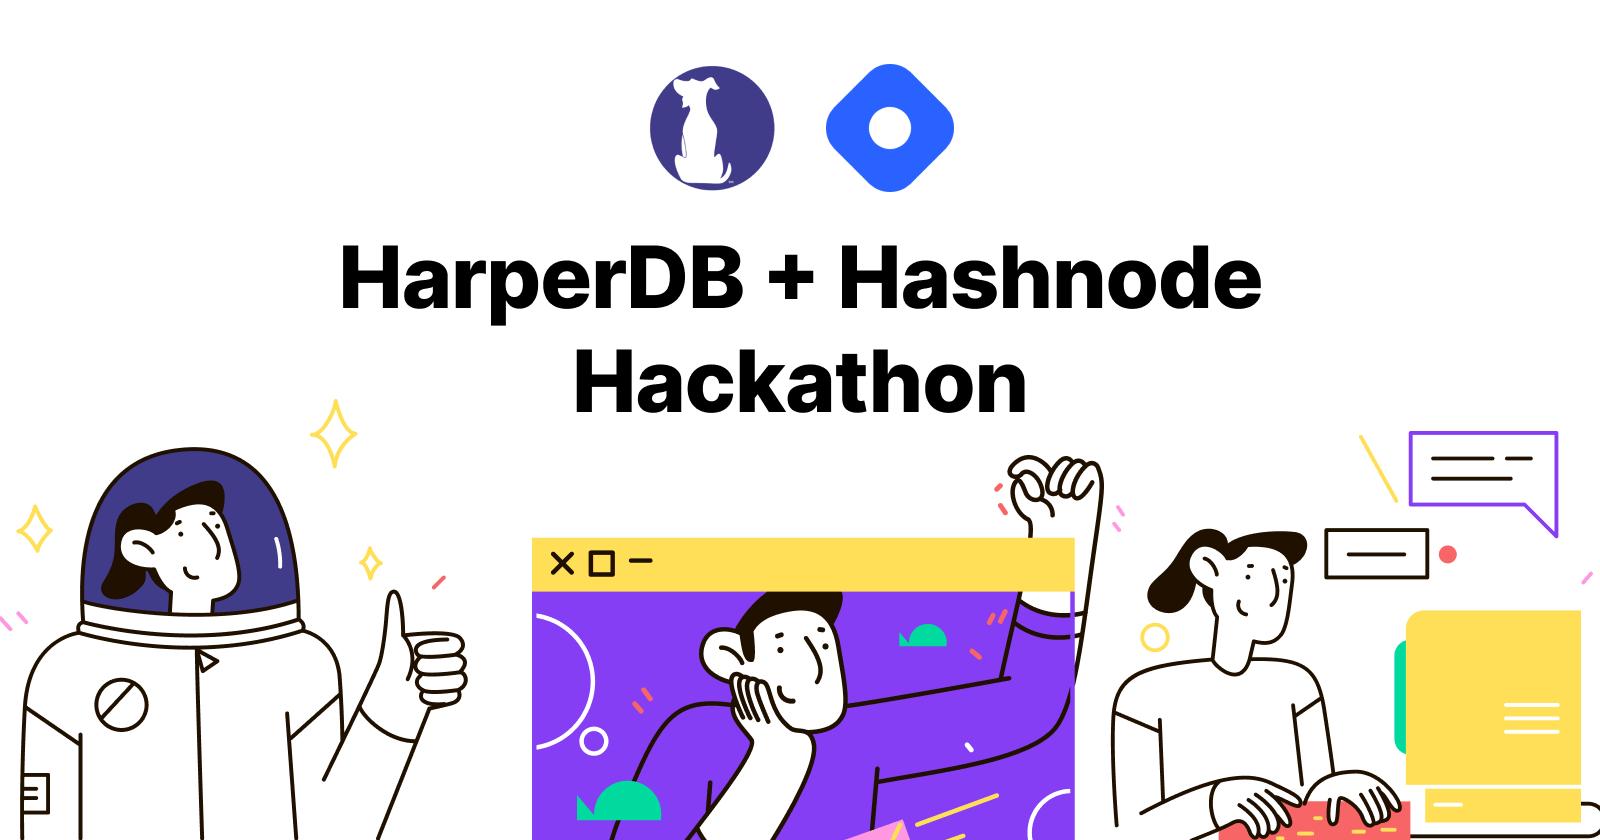 Announcing HarperDB Hackathon on Hashnode!